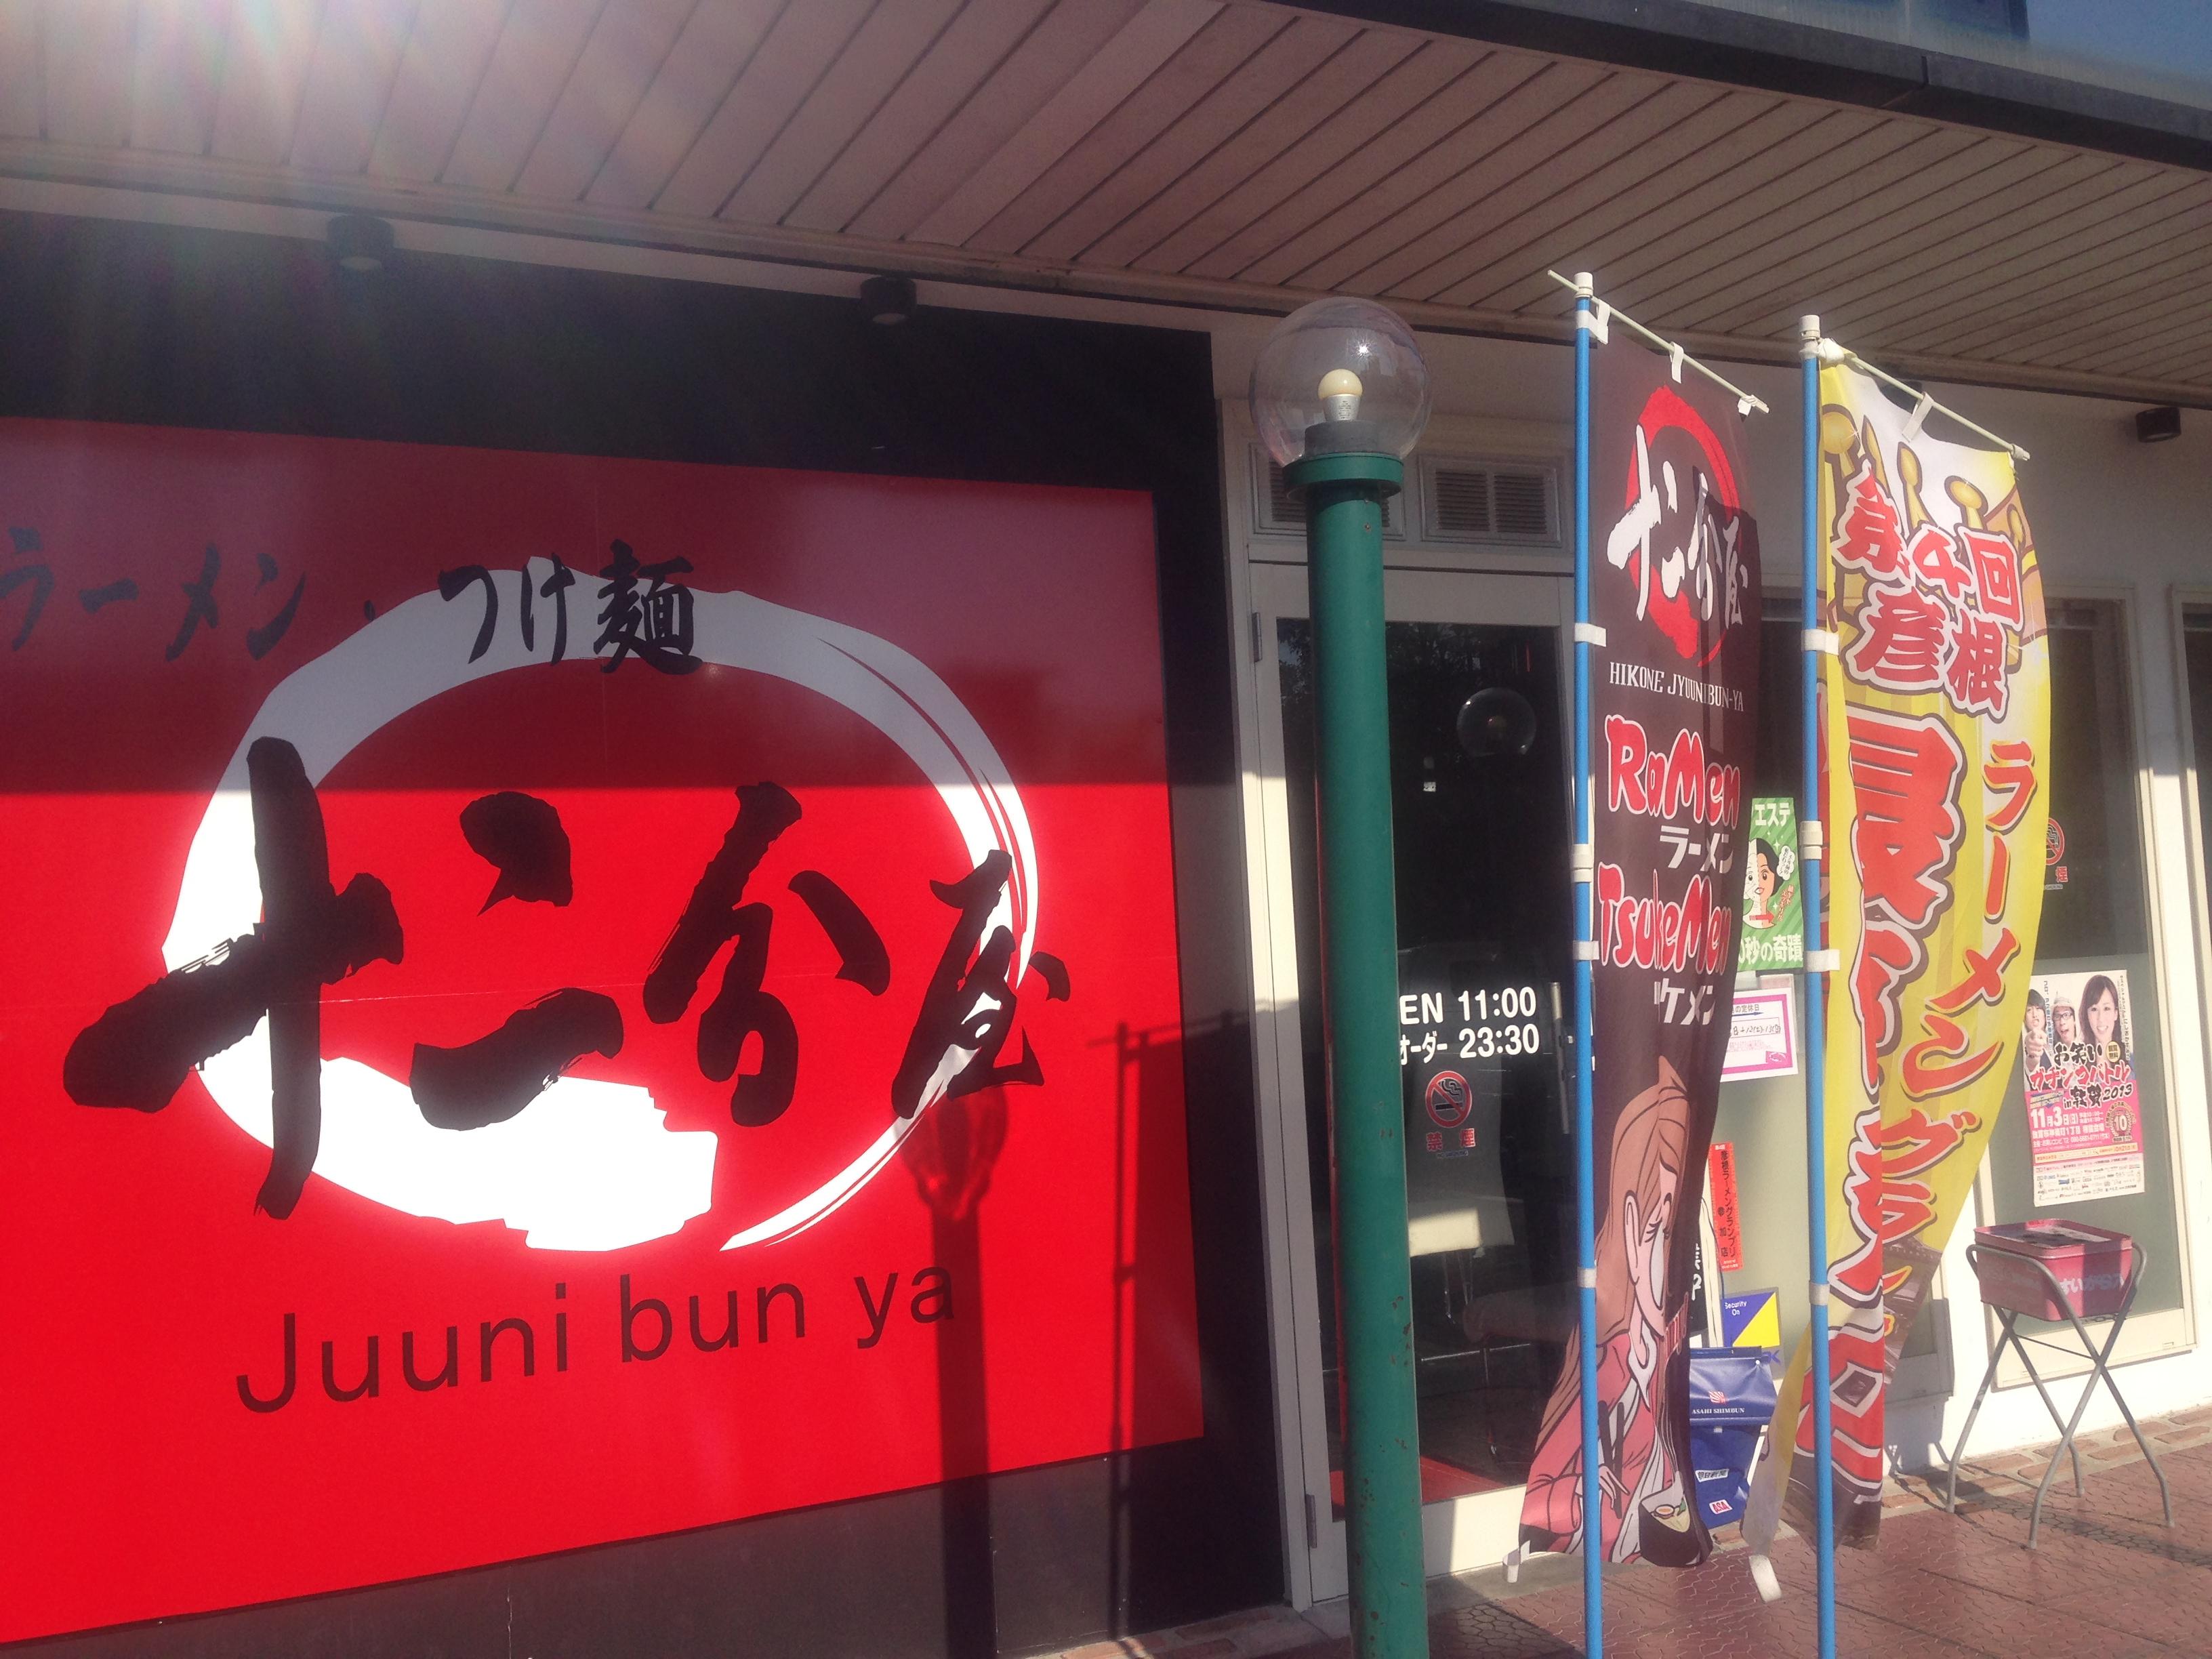 16期生「十二分屋」甲西店が滋賀県湖南市にオープン!